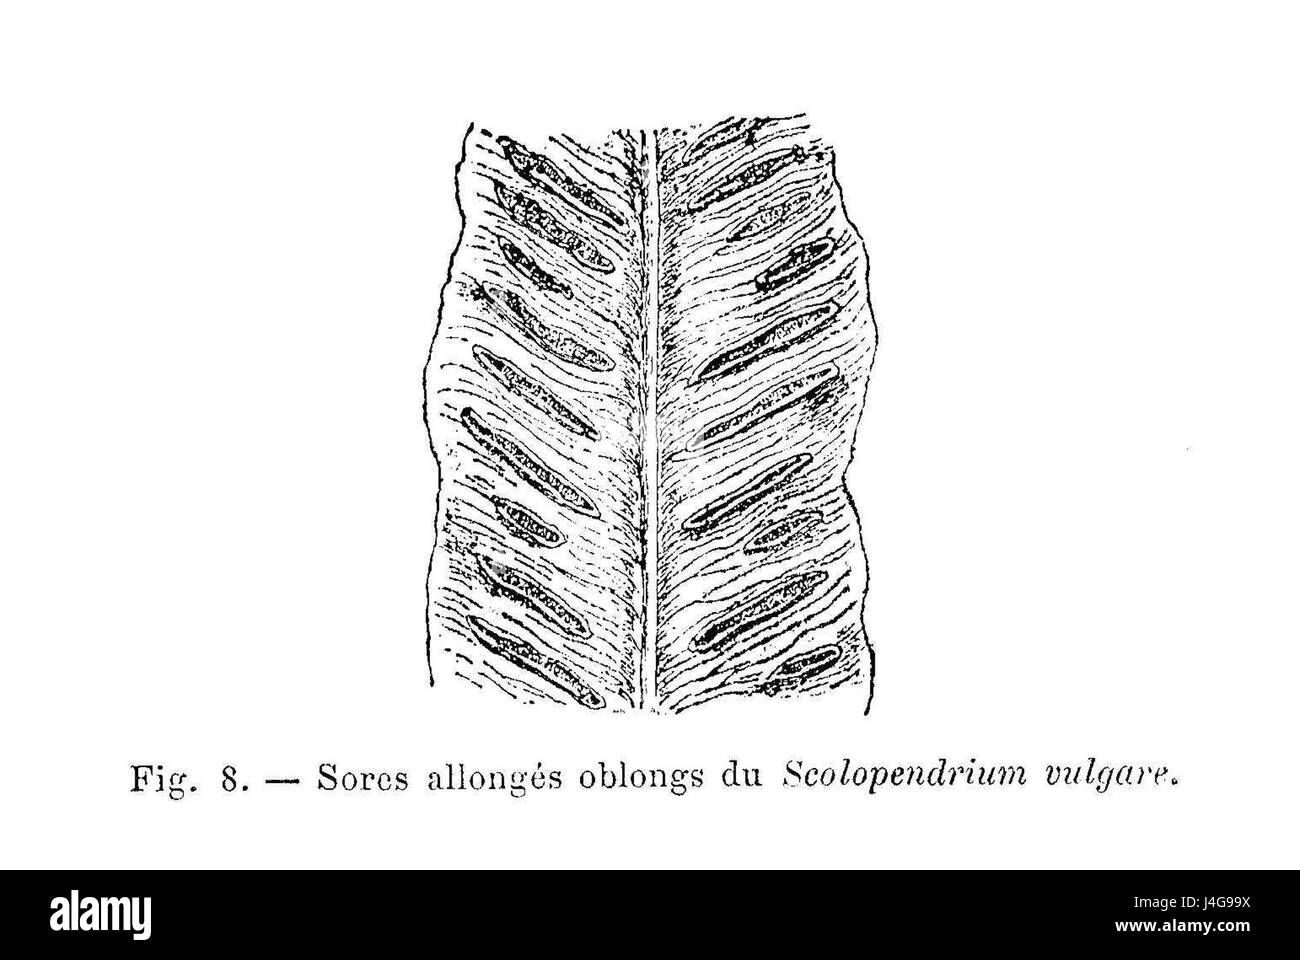 hight resolution of scolopendrium vulgare limbe avec sores stock image